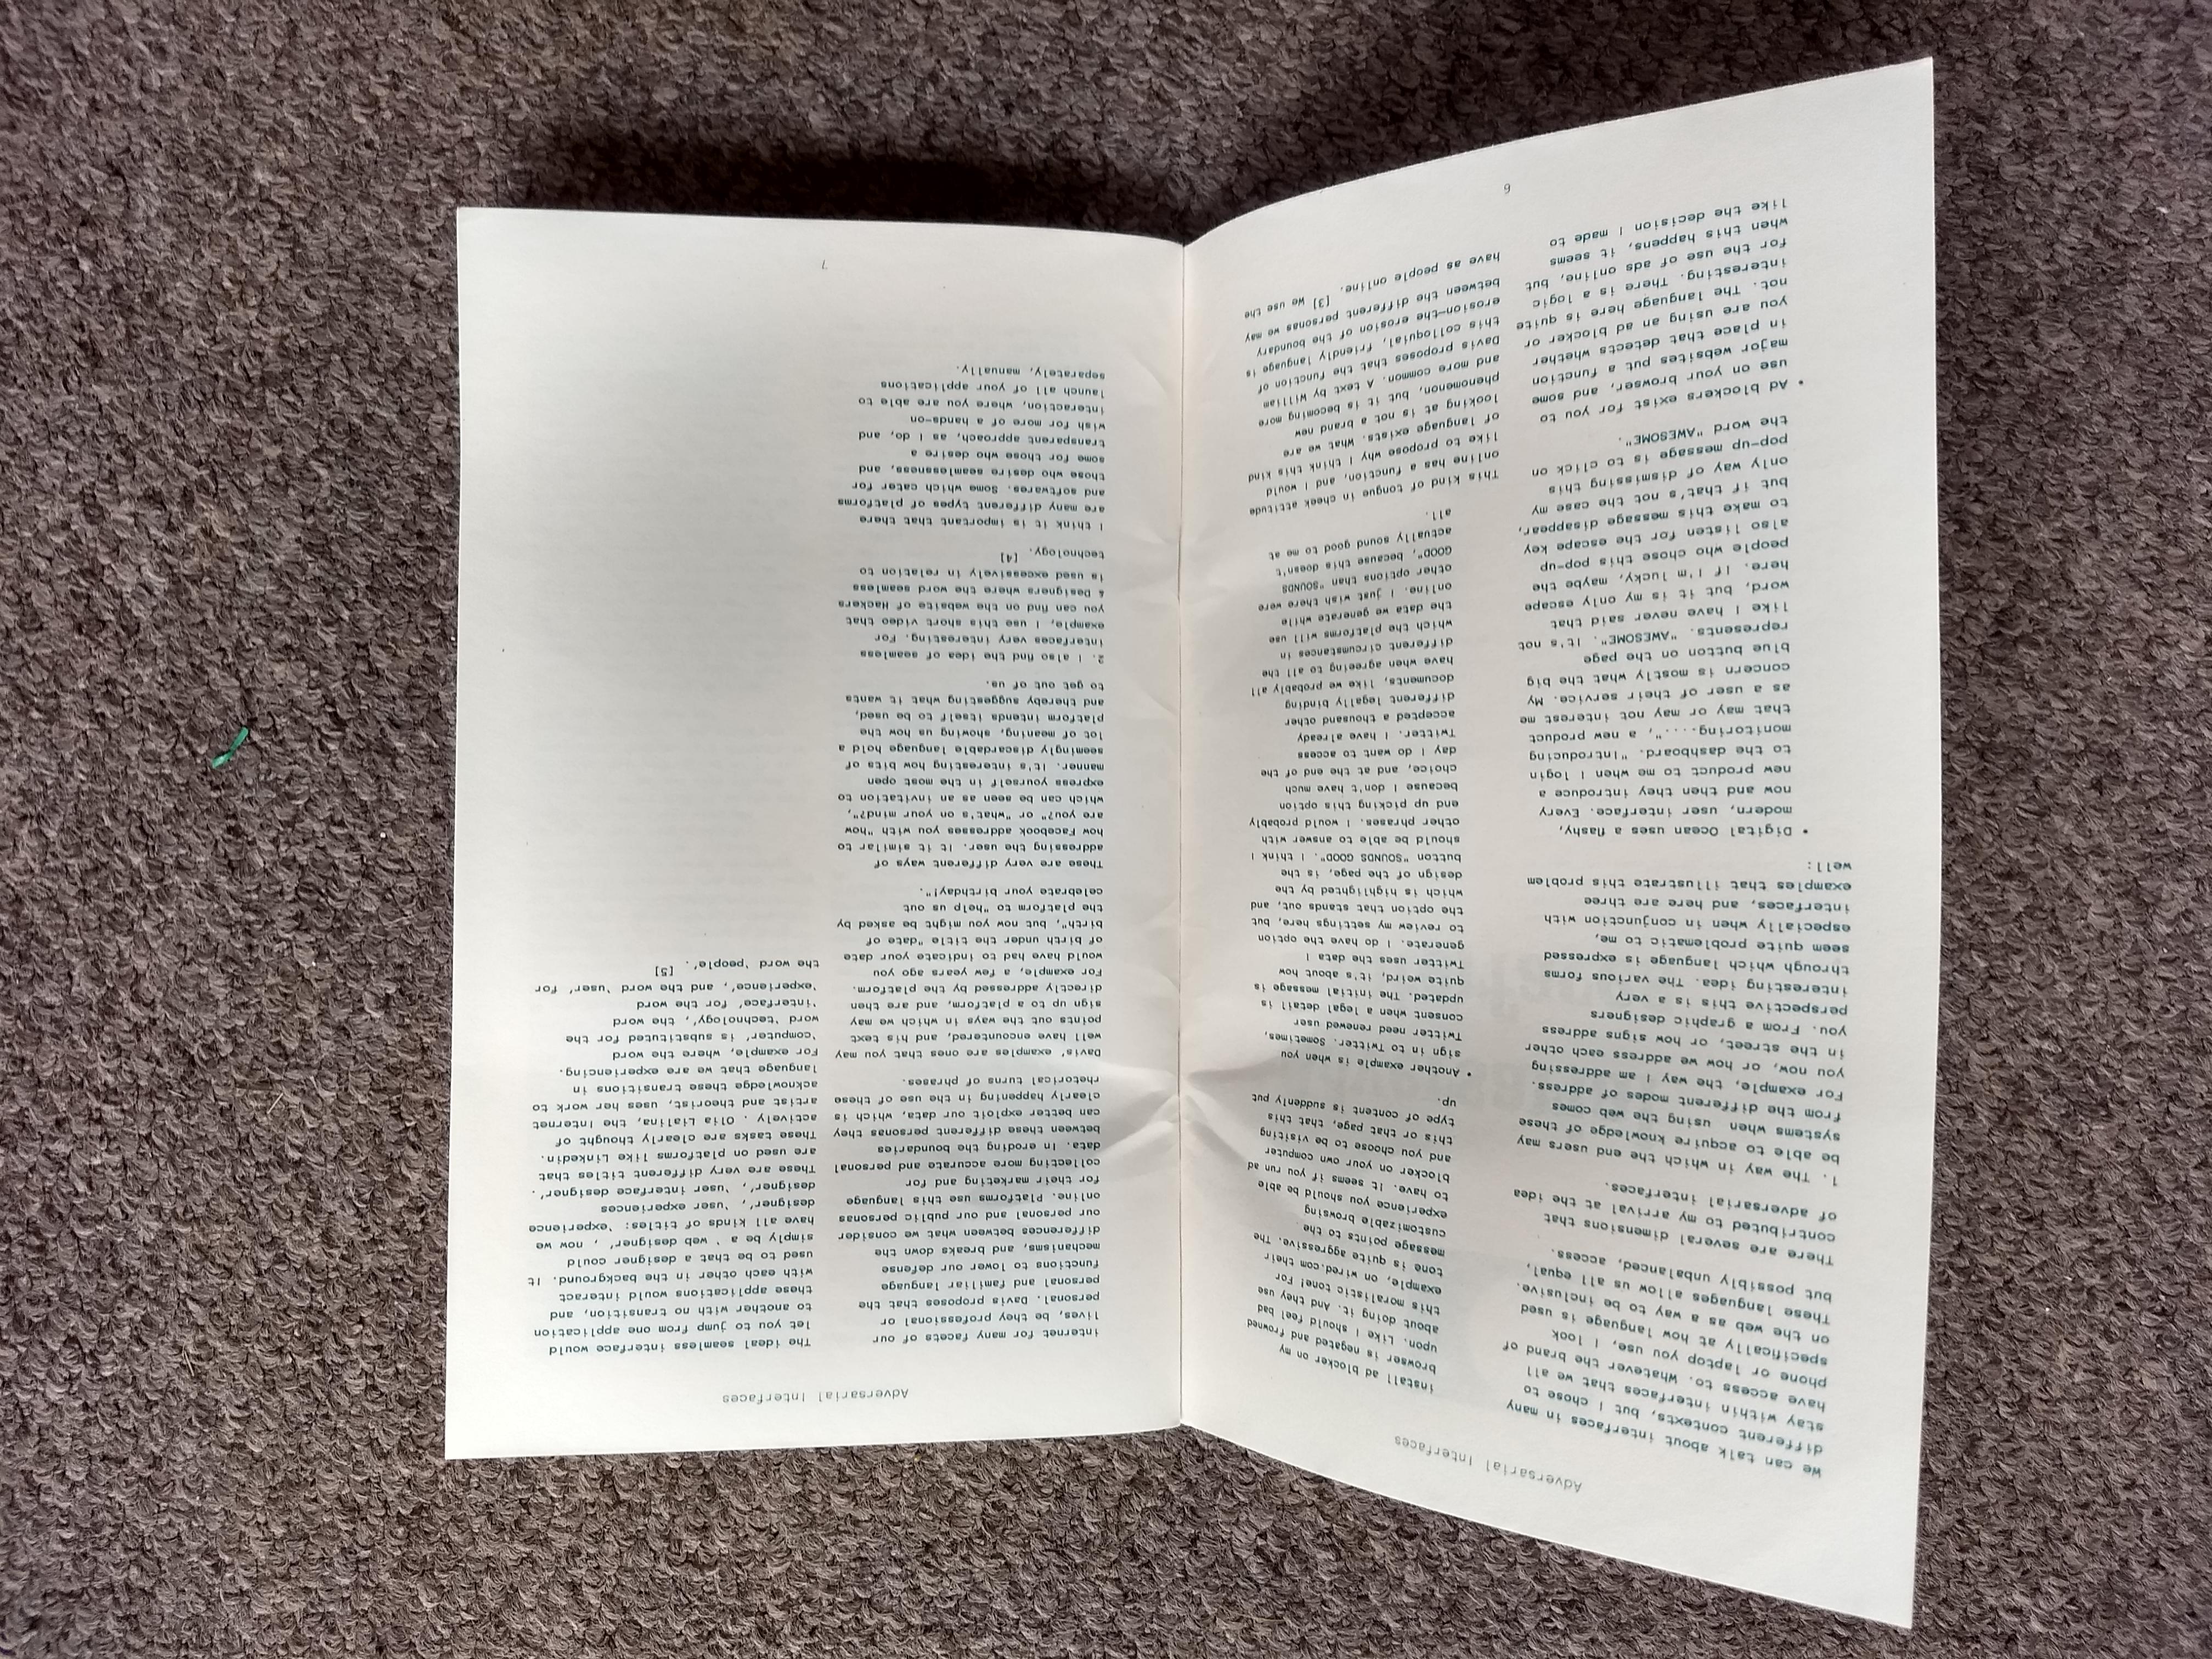 FlaskApp/static/images/samples-of-work/publications/hnd-fake-it8.jpg